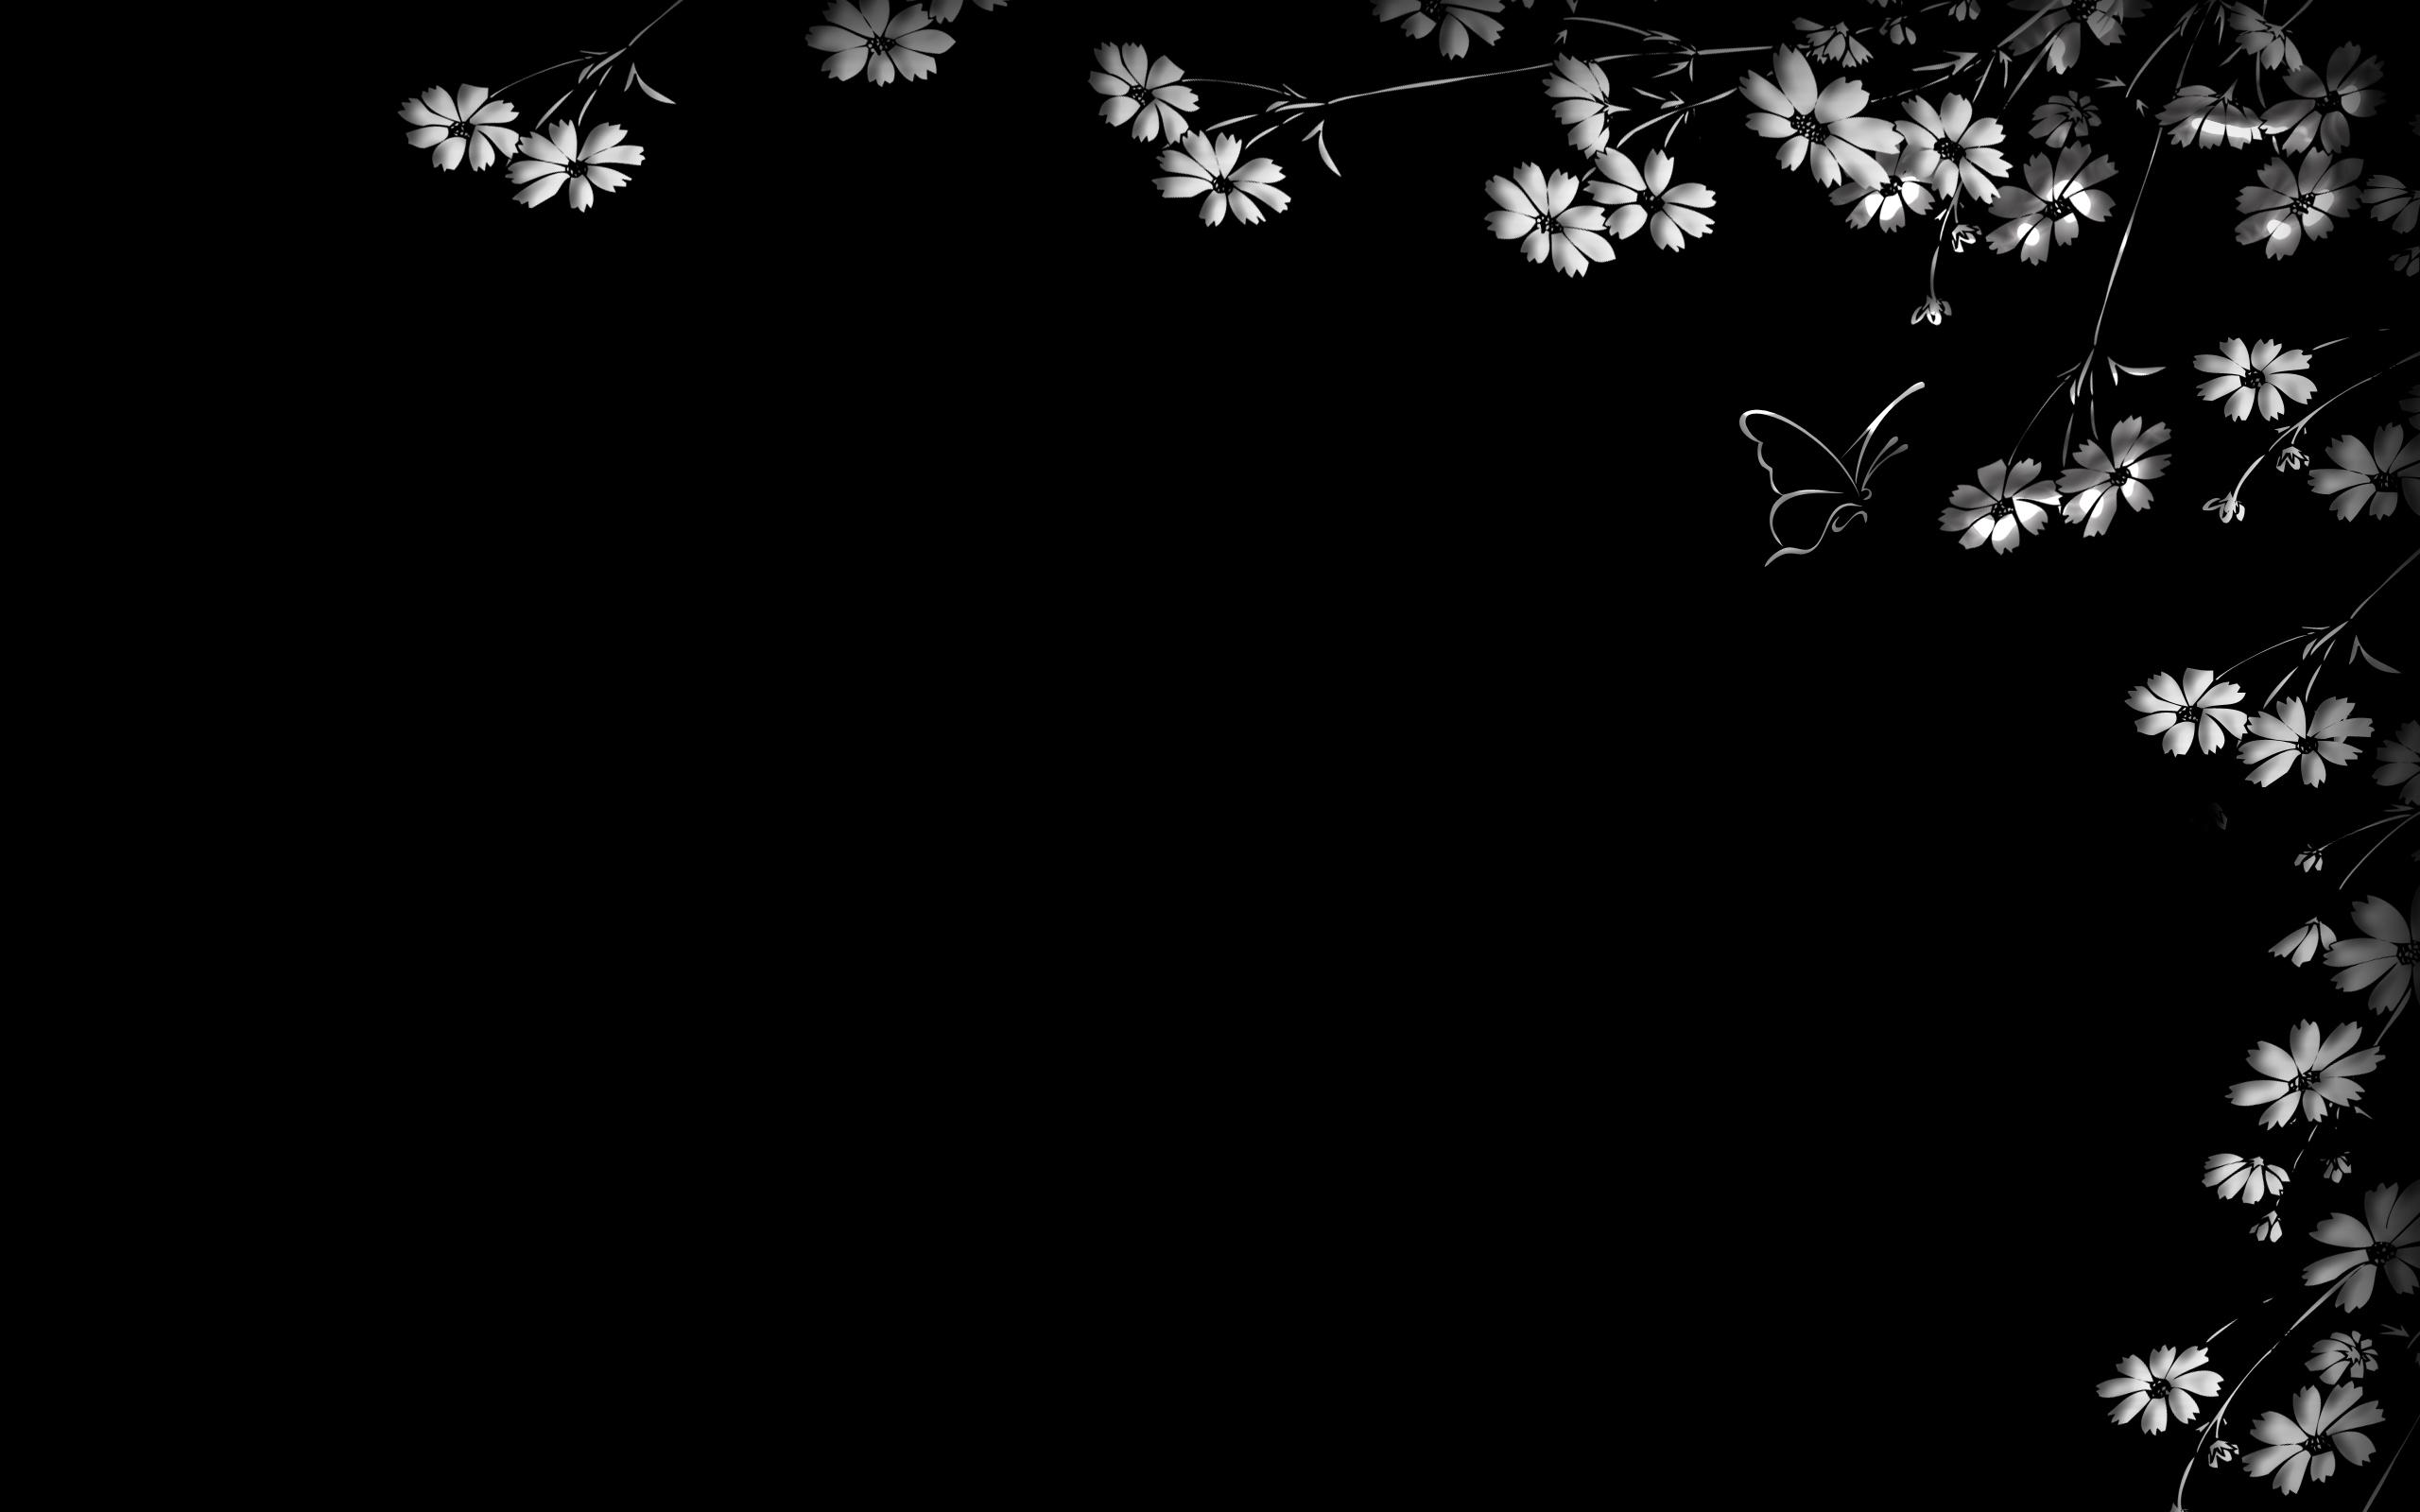 Unduh 4700 Background Ppt Monochrome Gratis Terbaru